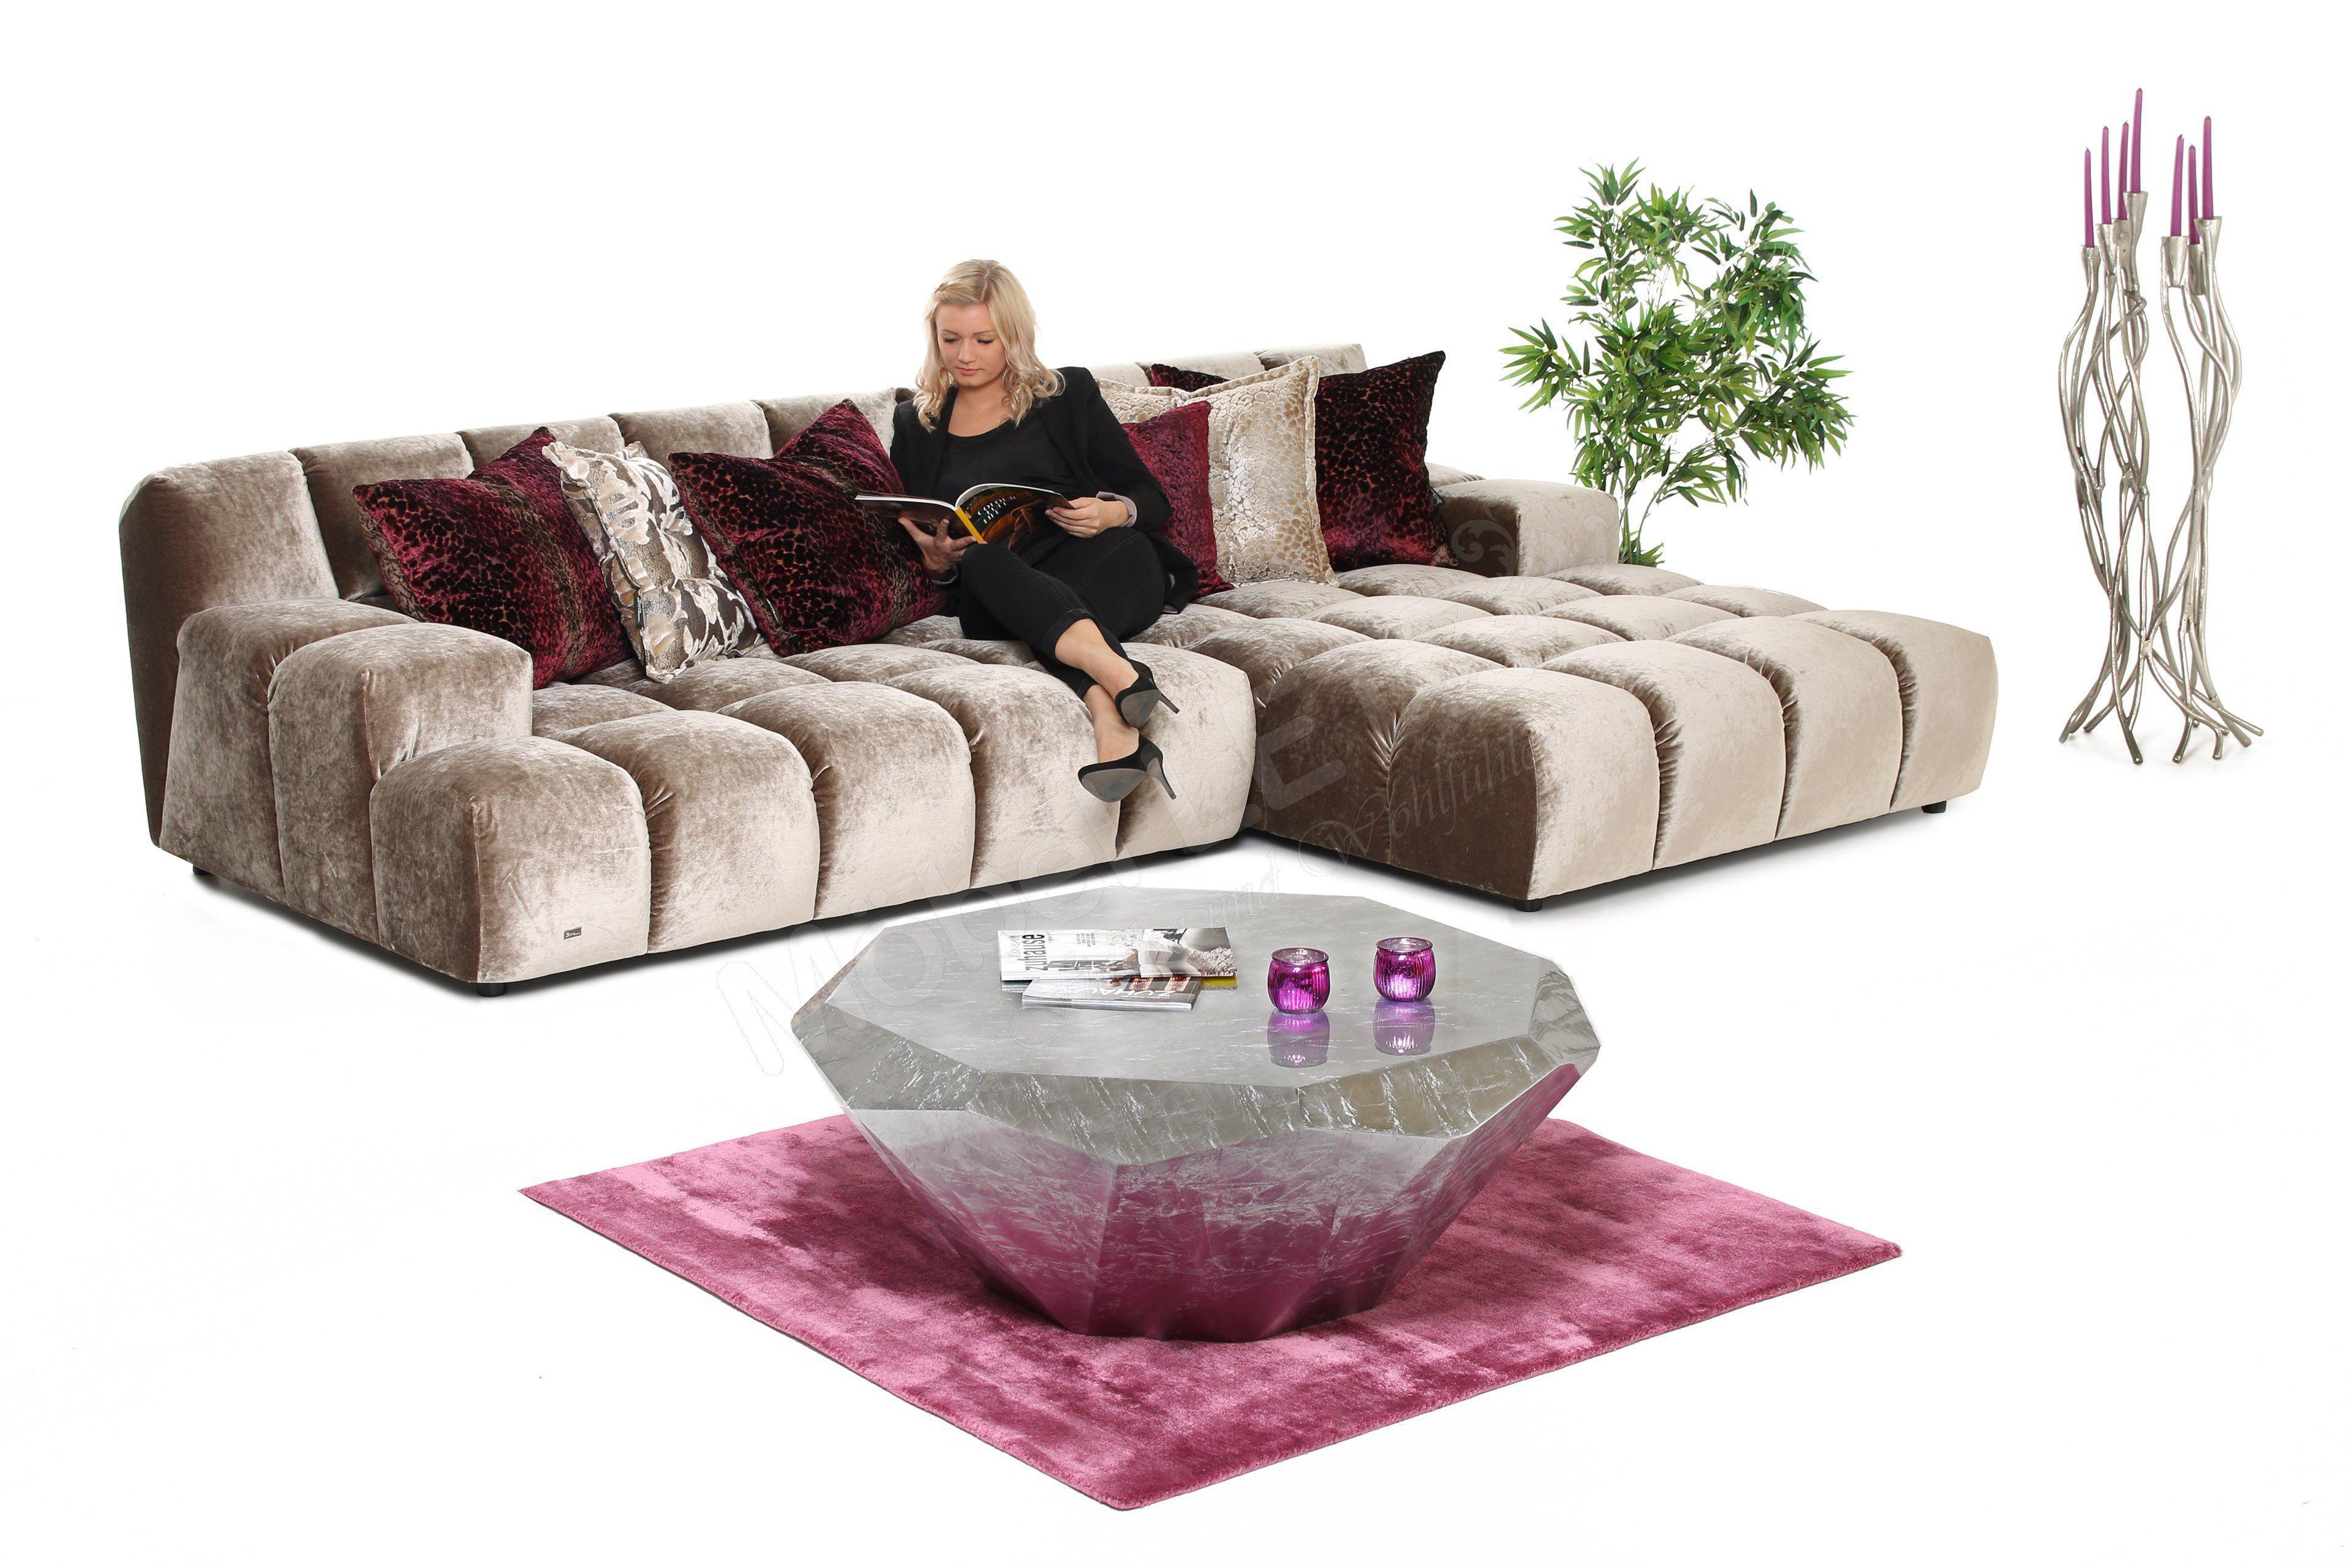 bretz ocean 7 ecksofa austernpilz m bel letz ihr online shop. Black Bedroom Furniture Sets. Home Design Ideas